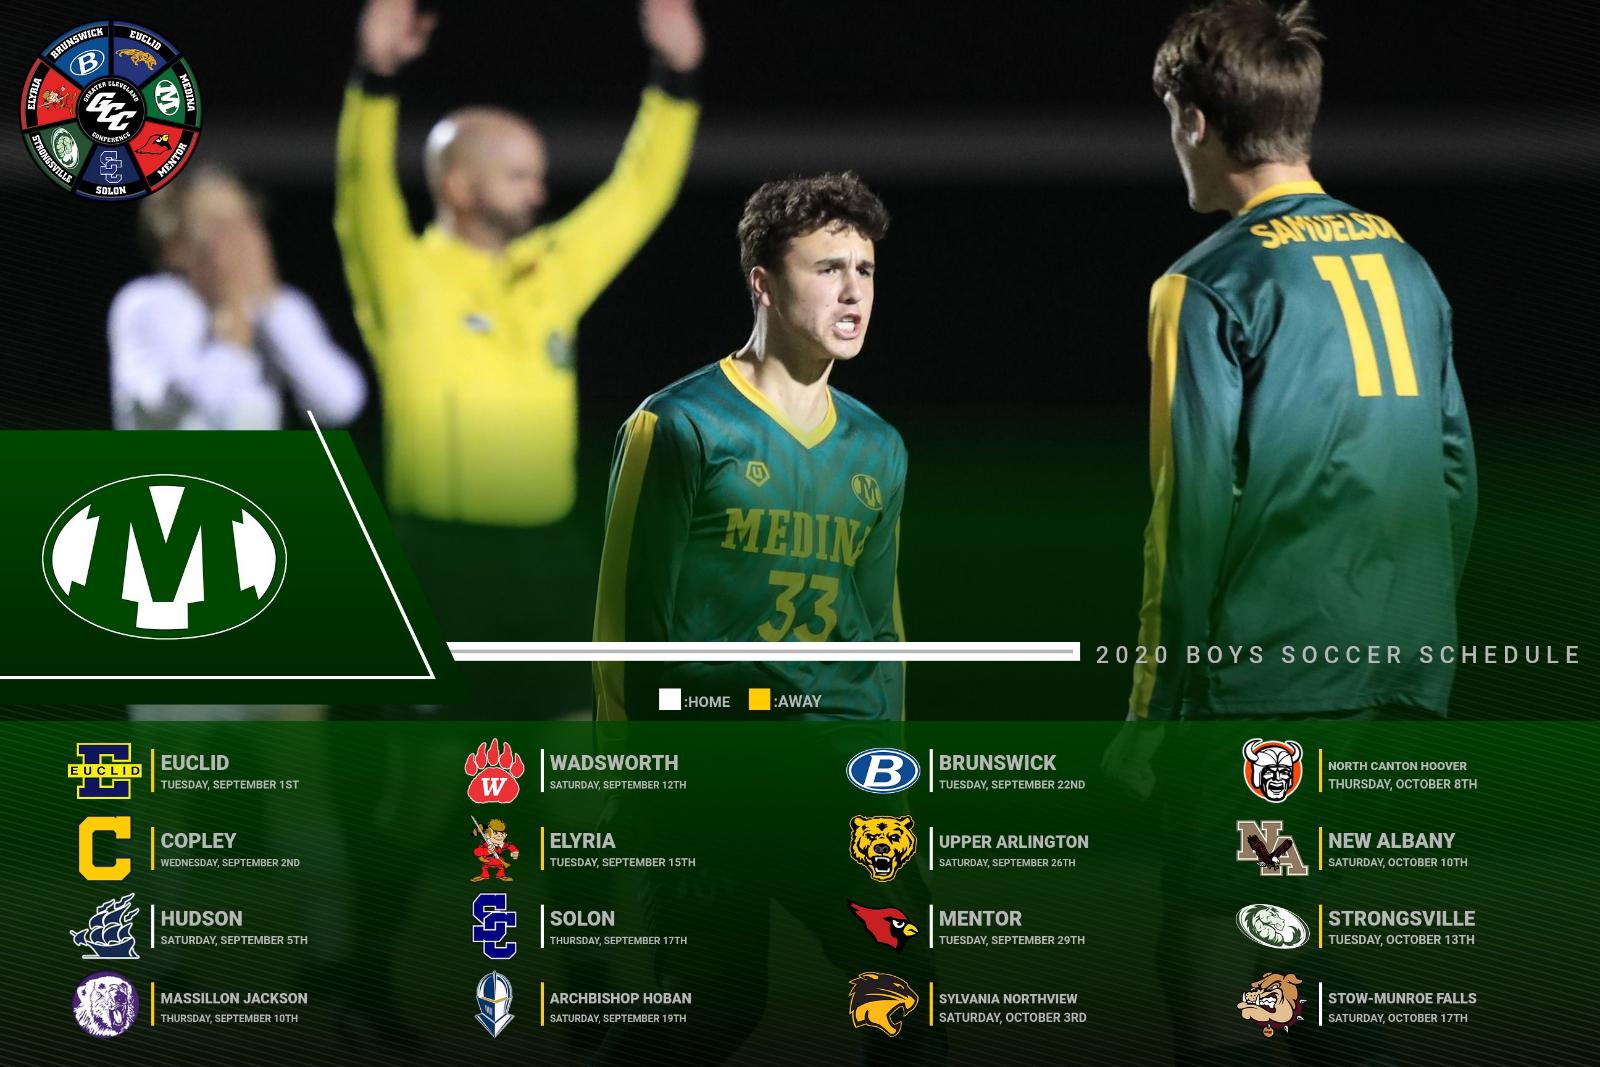 2020 Varsity Boys Soccer Schedule